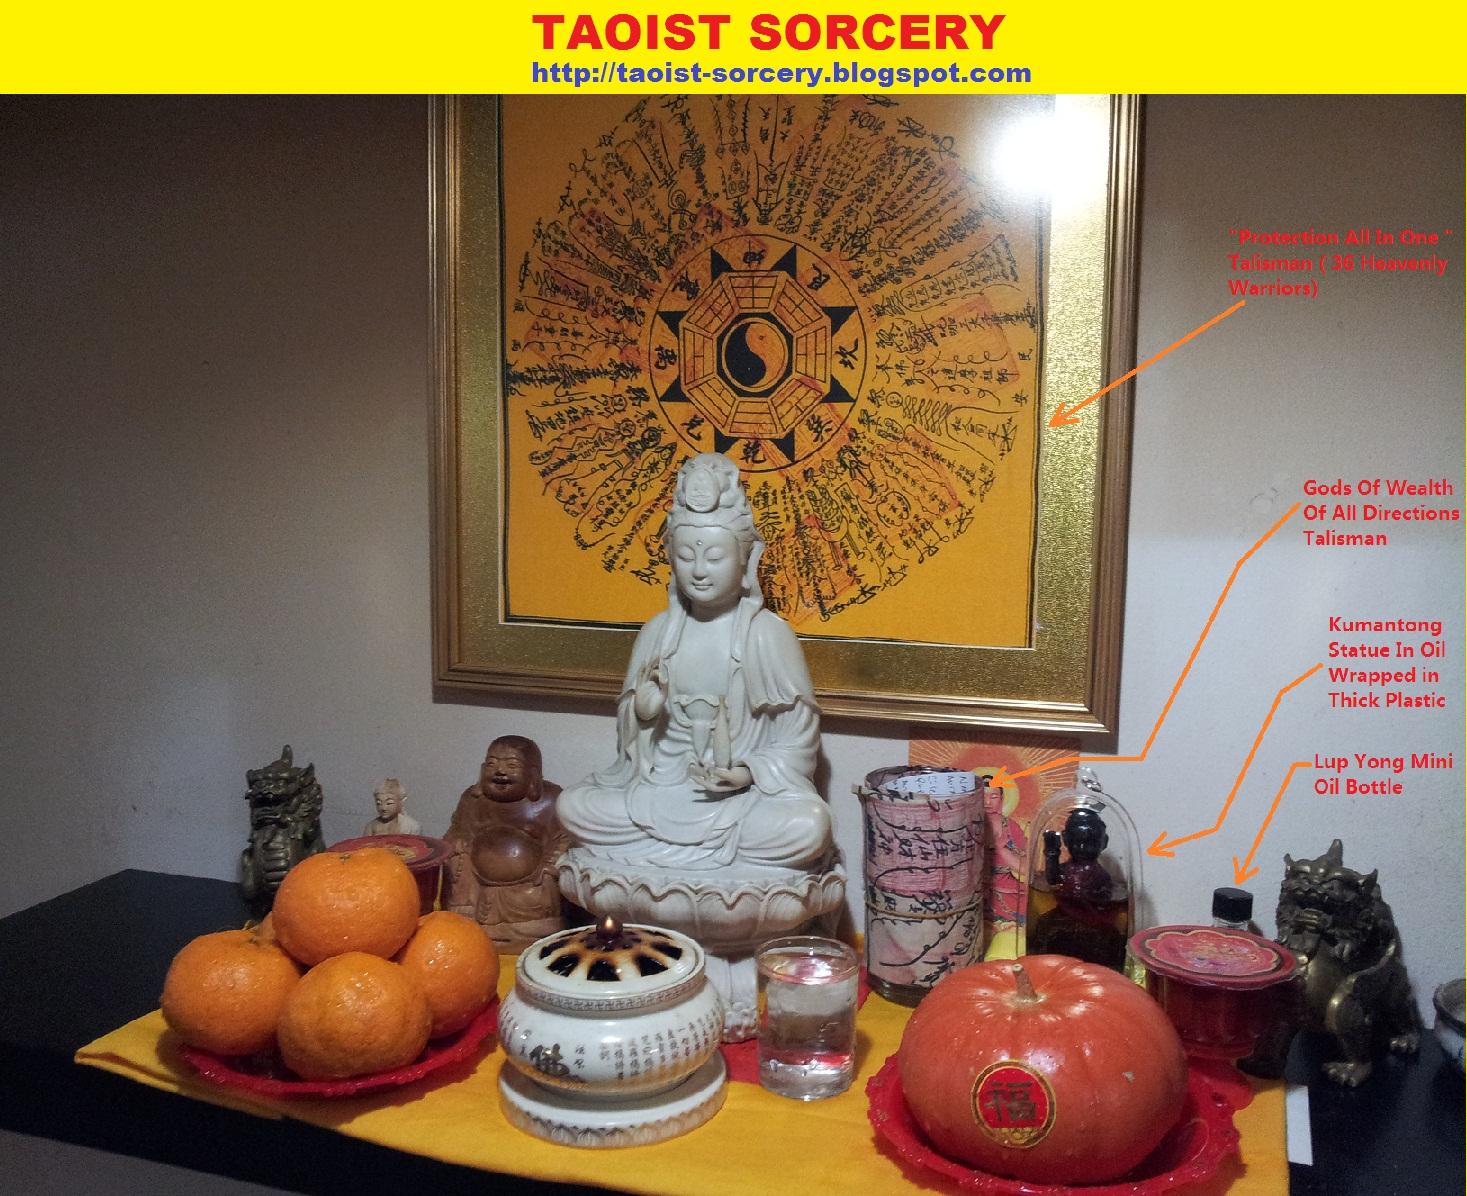 TAOIST SORCERY: Activate Your Taoist Altar with